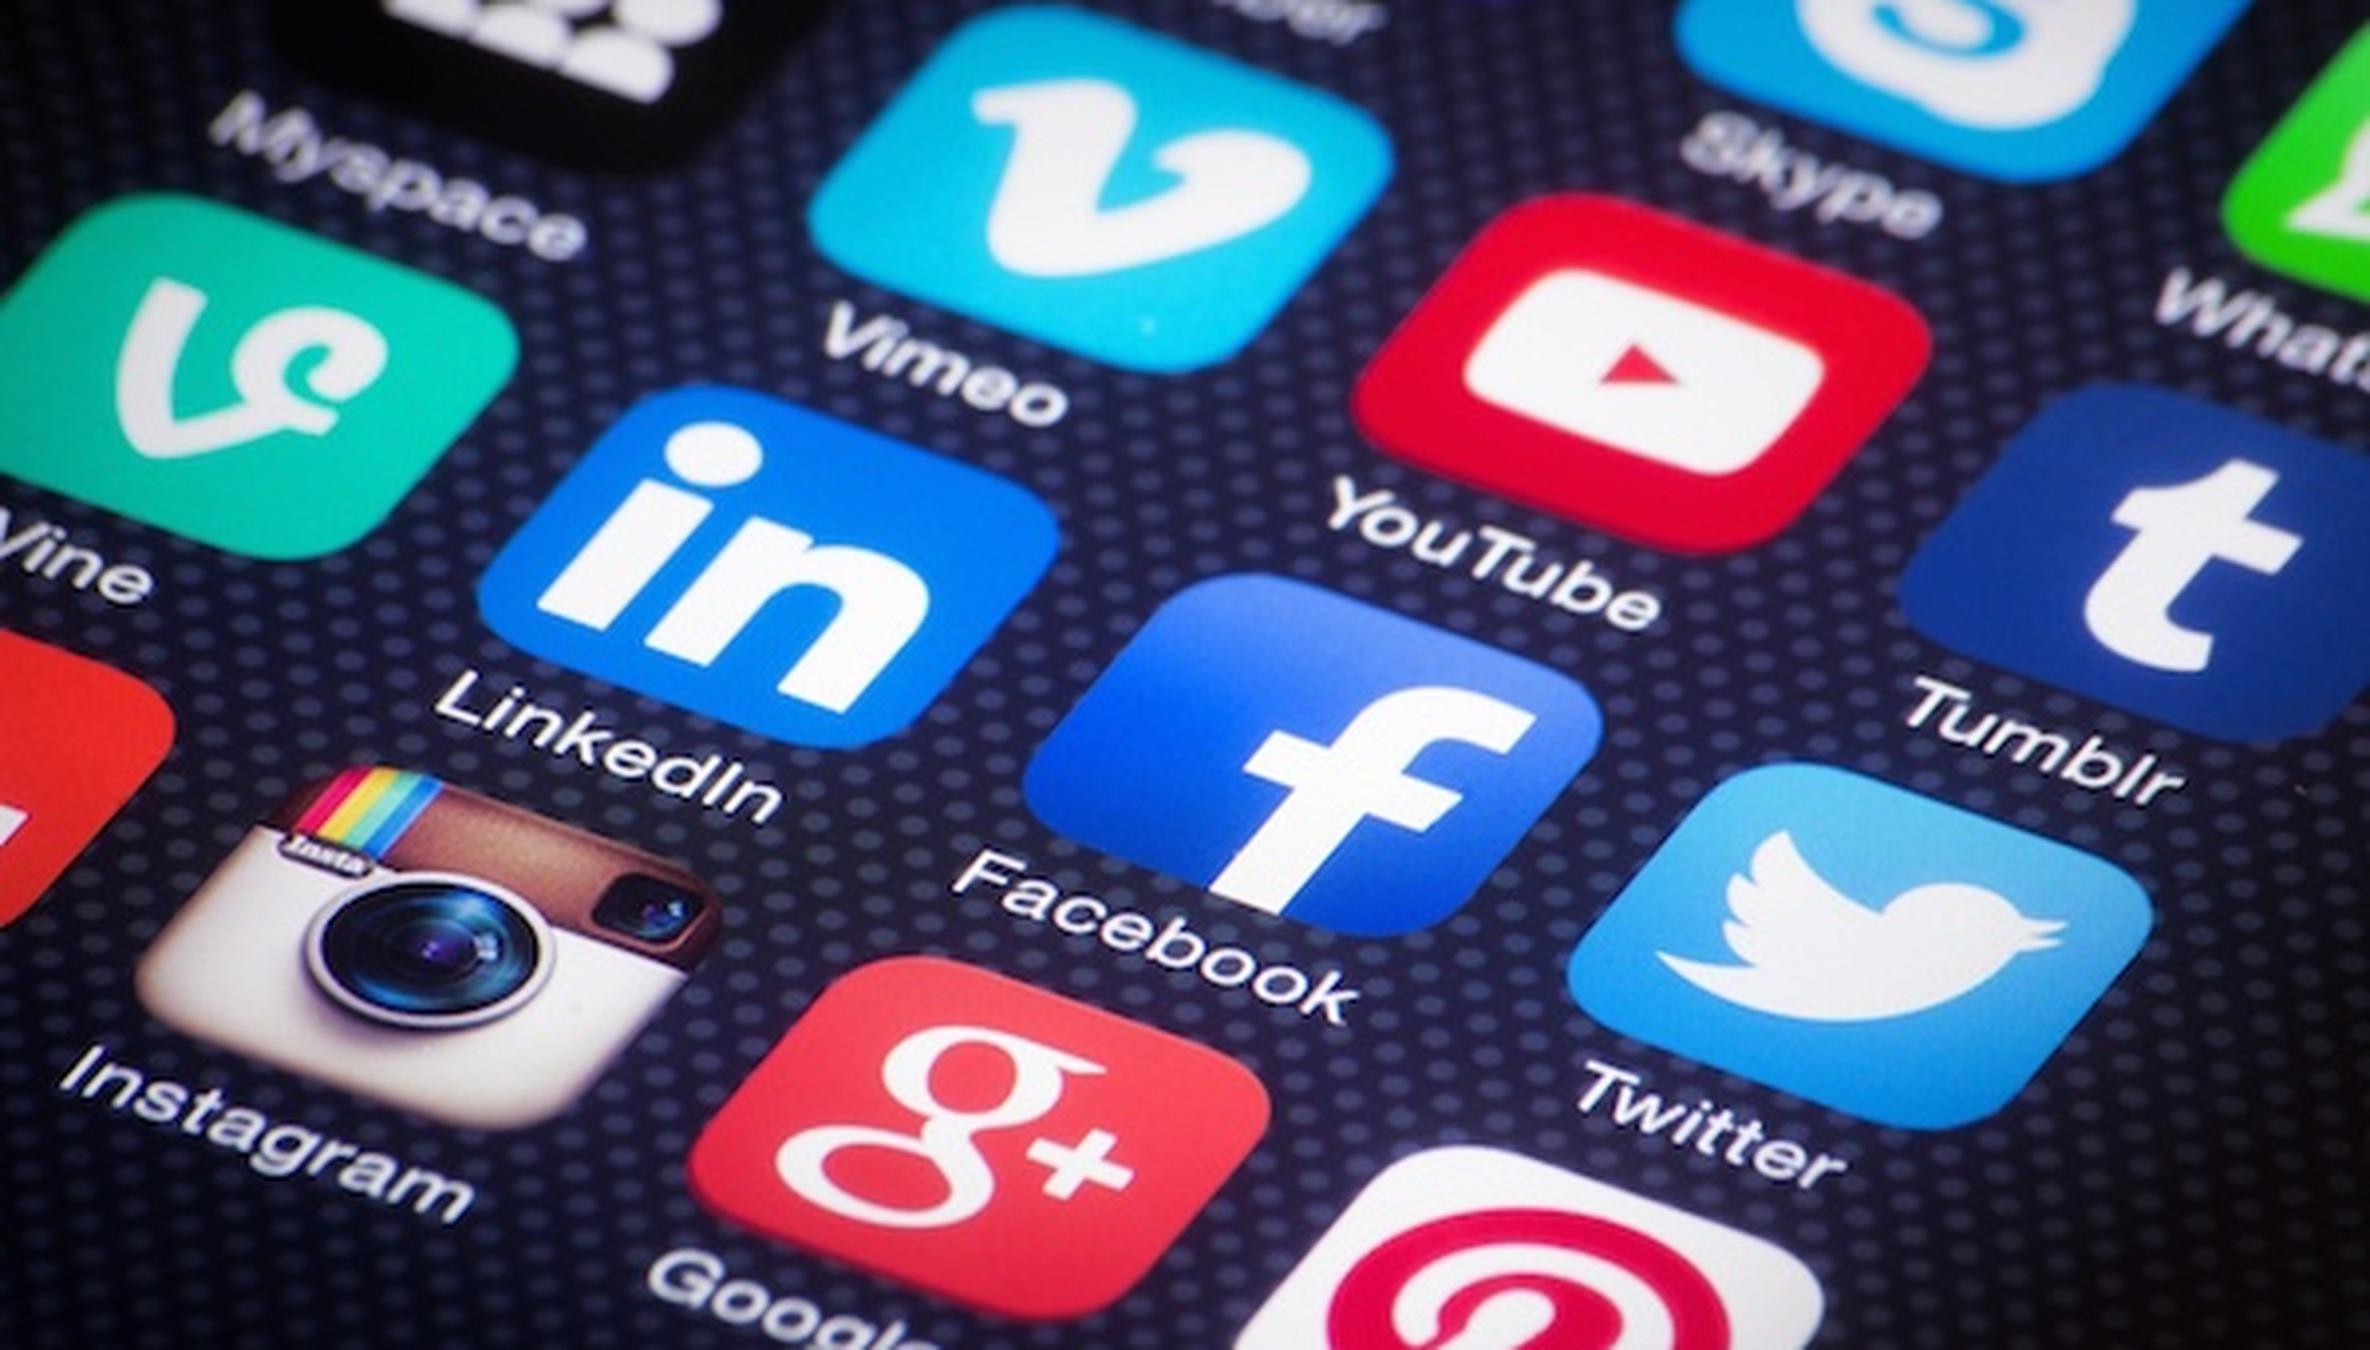 6 Texas Agents to Follow on Social Media